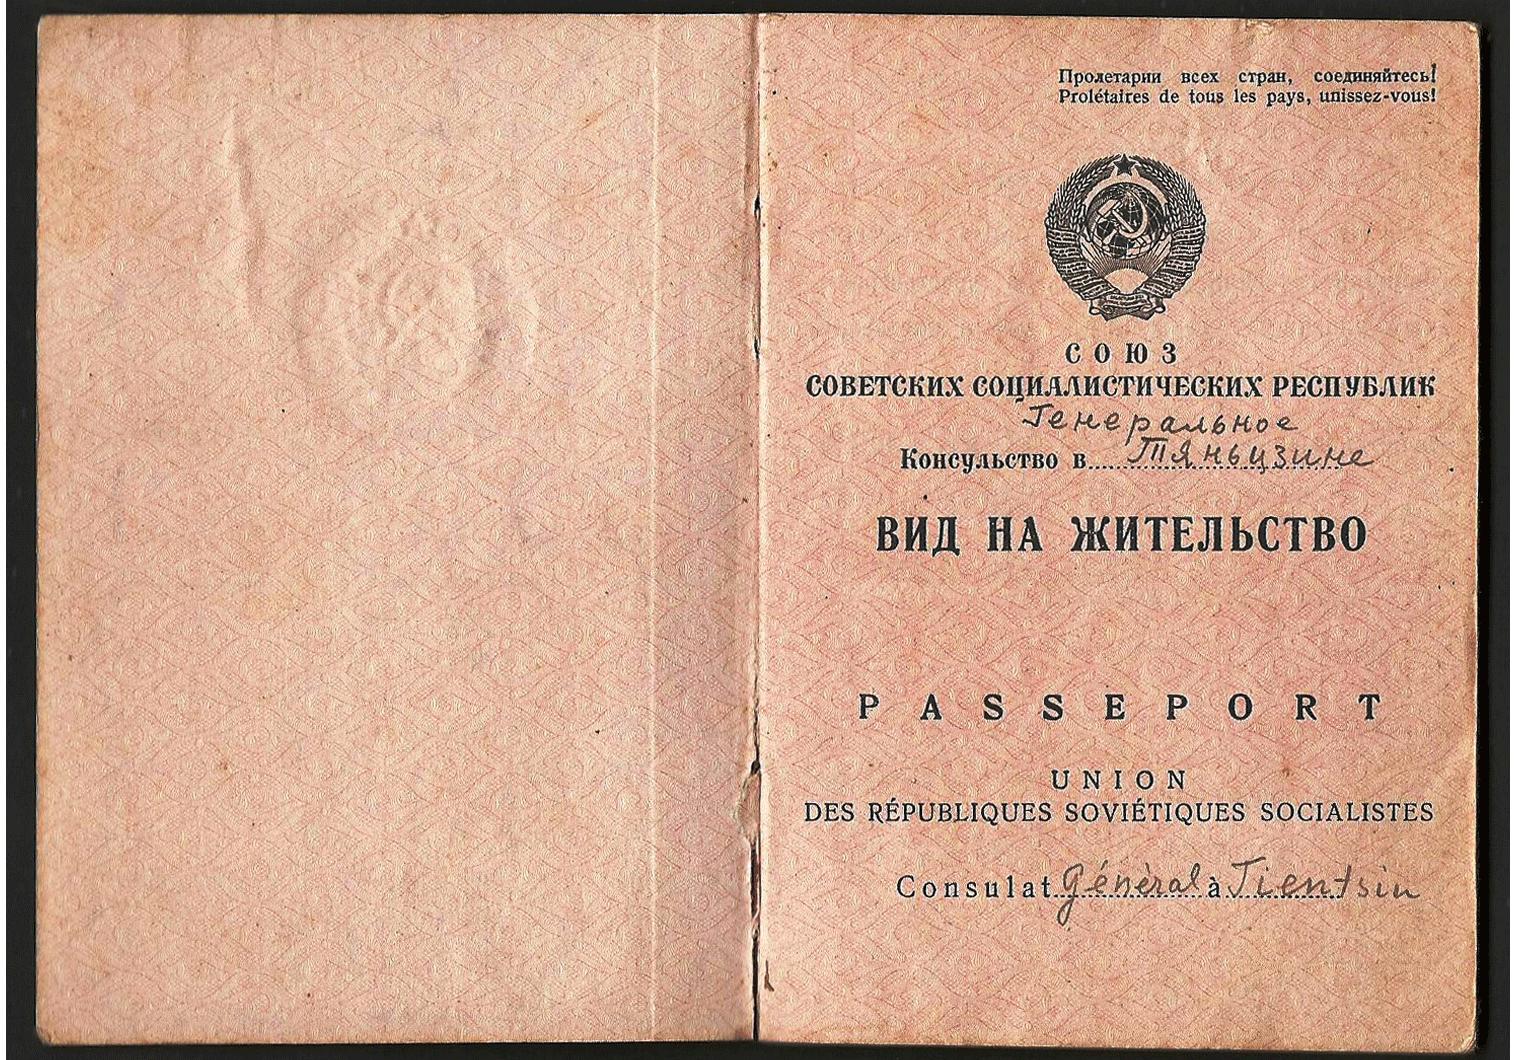 1946 Soviet passport